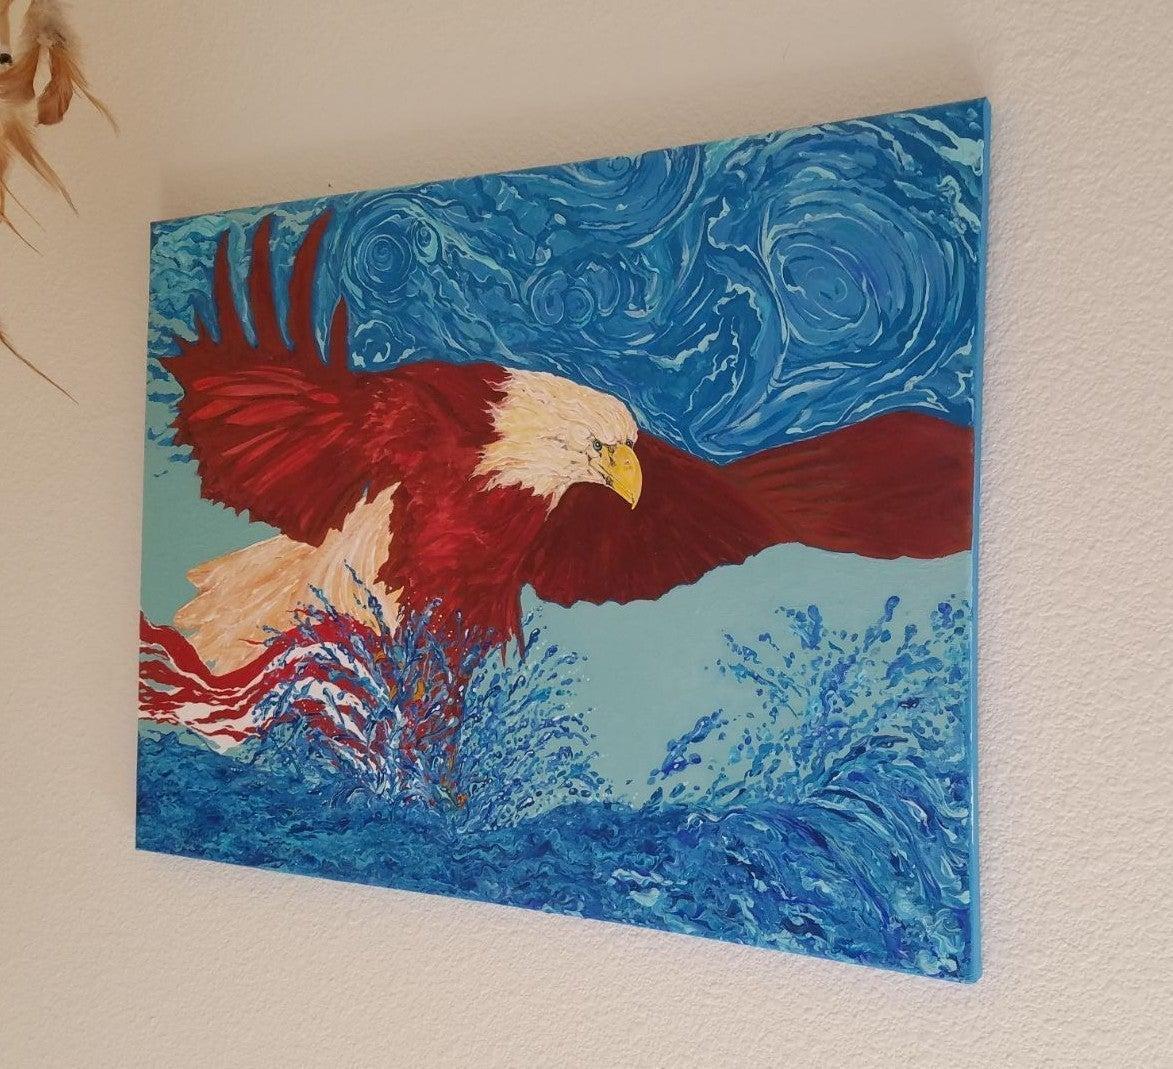 """EAGLE RESCUING AMERICAN FLAG"" ORIGINAL"